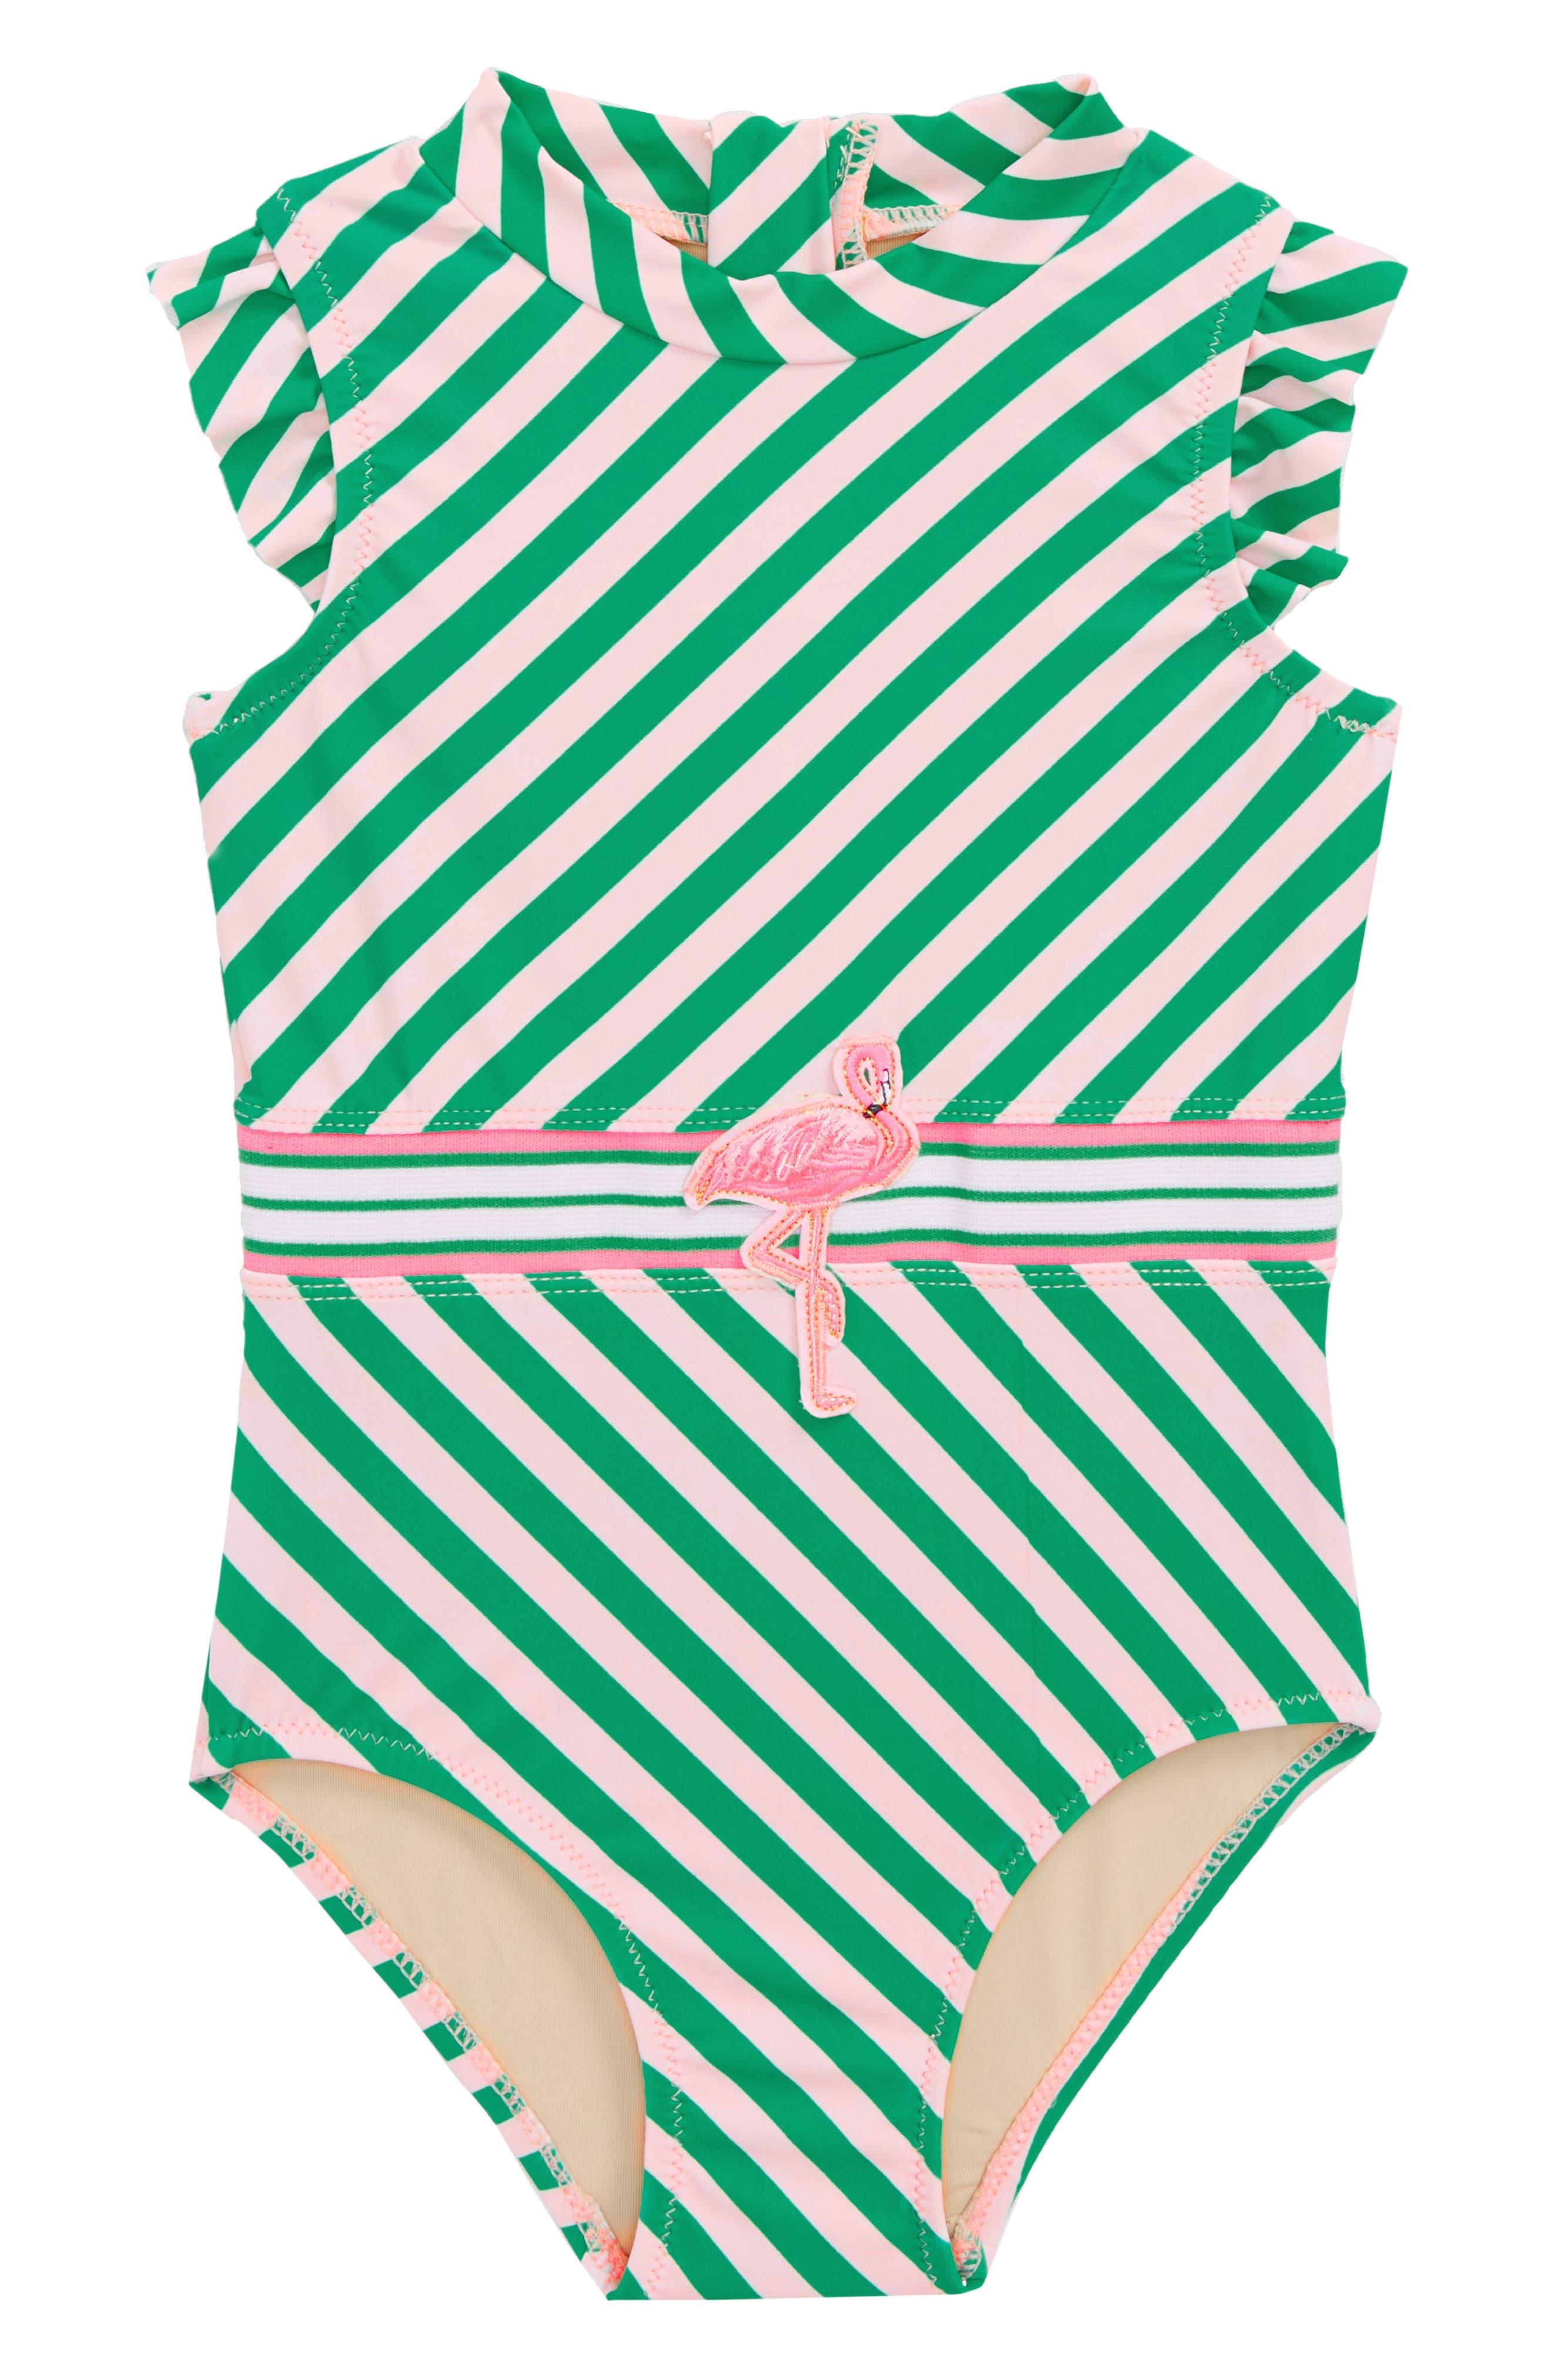 Shade Critters Flamingo Belt One-Piece Swimsuit (Toddler Girls & Little Girls)